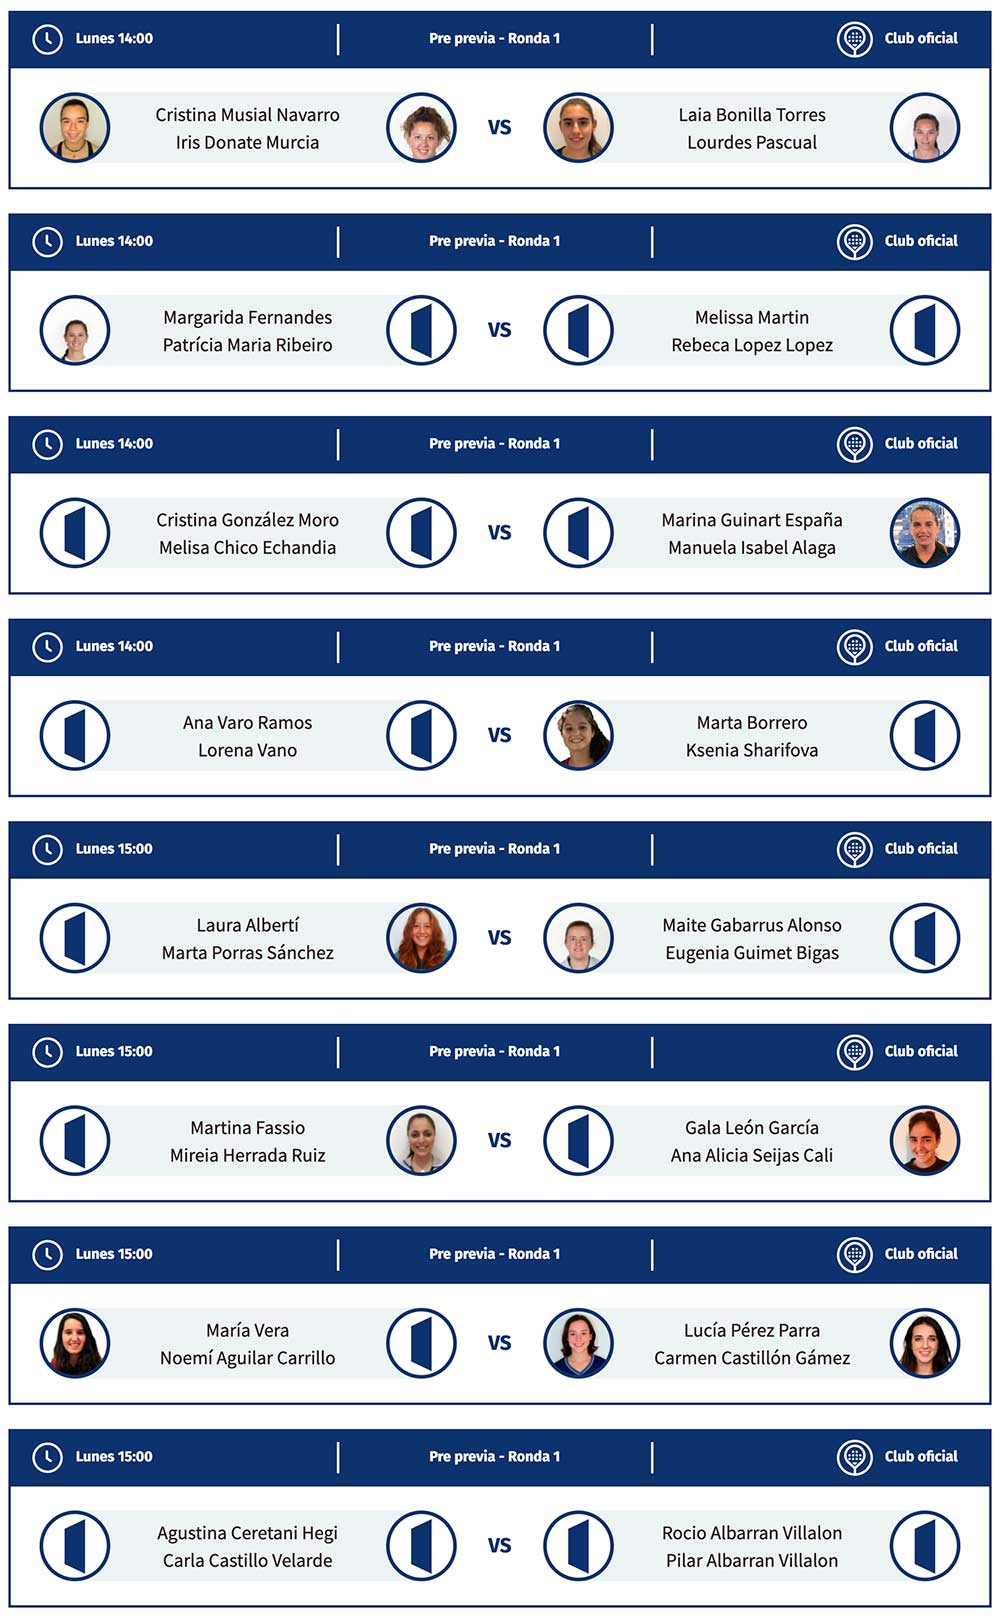 Primera ronda de la pre previa femenina del Santander Open 2021